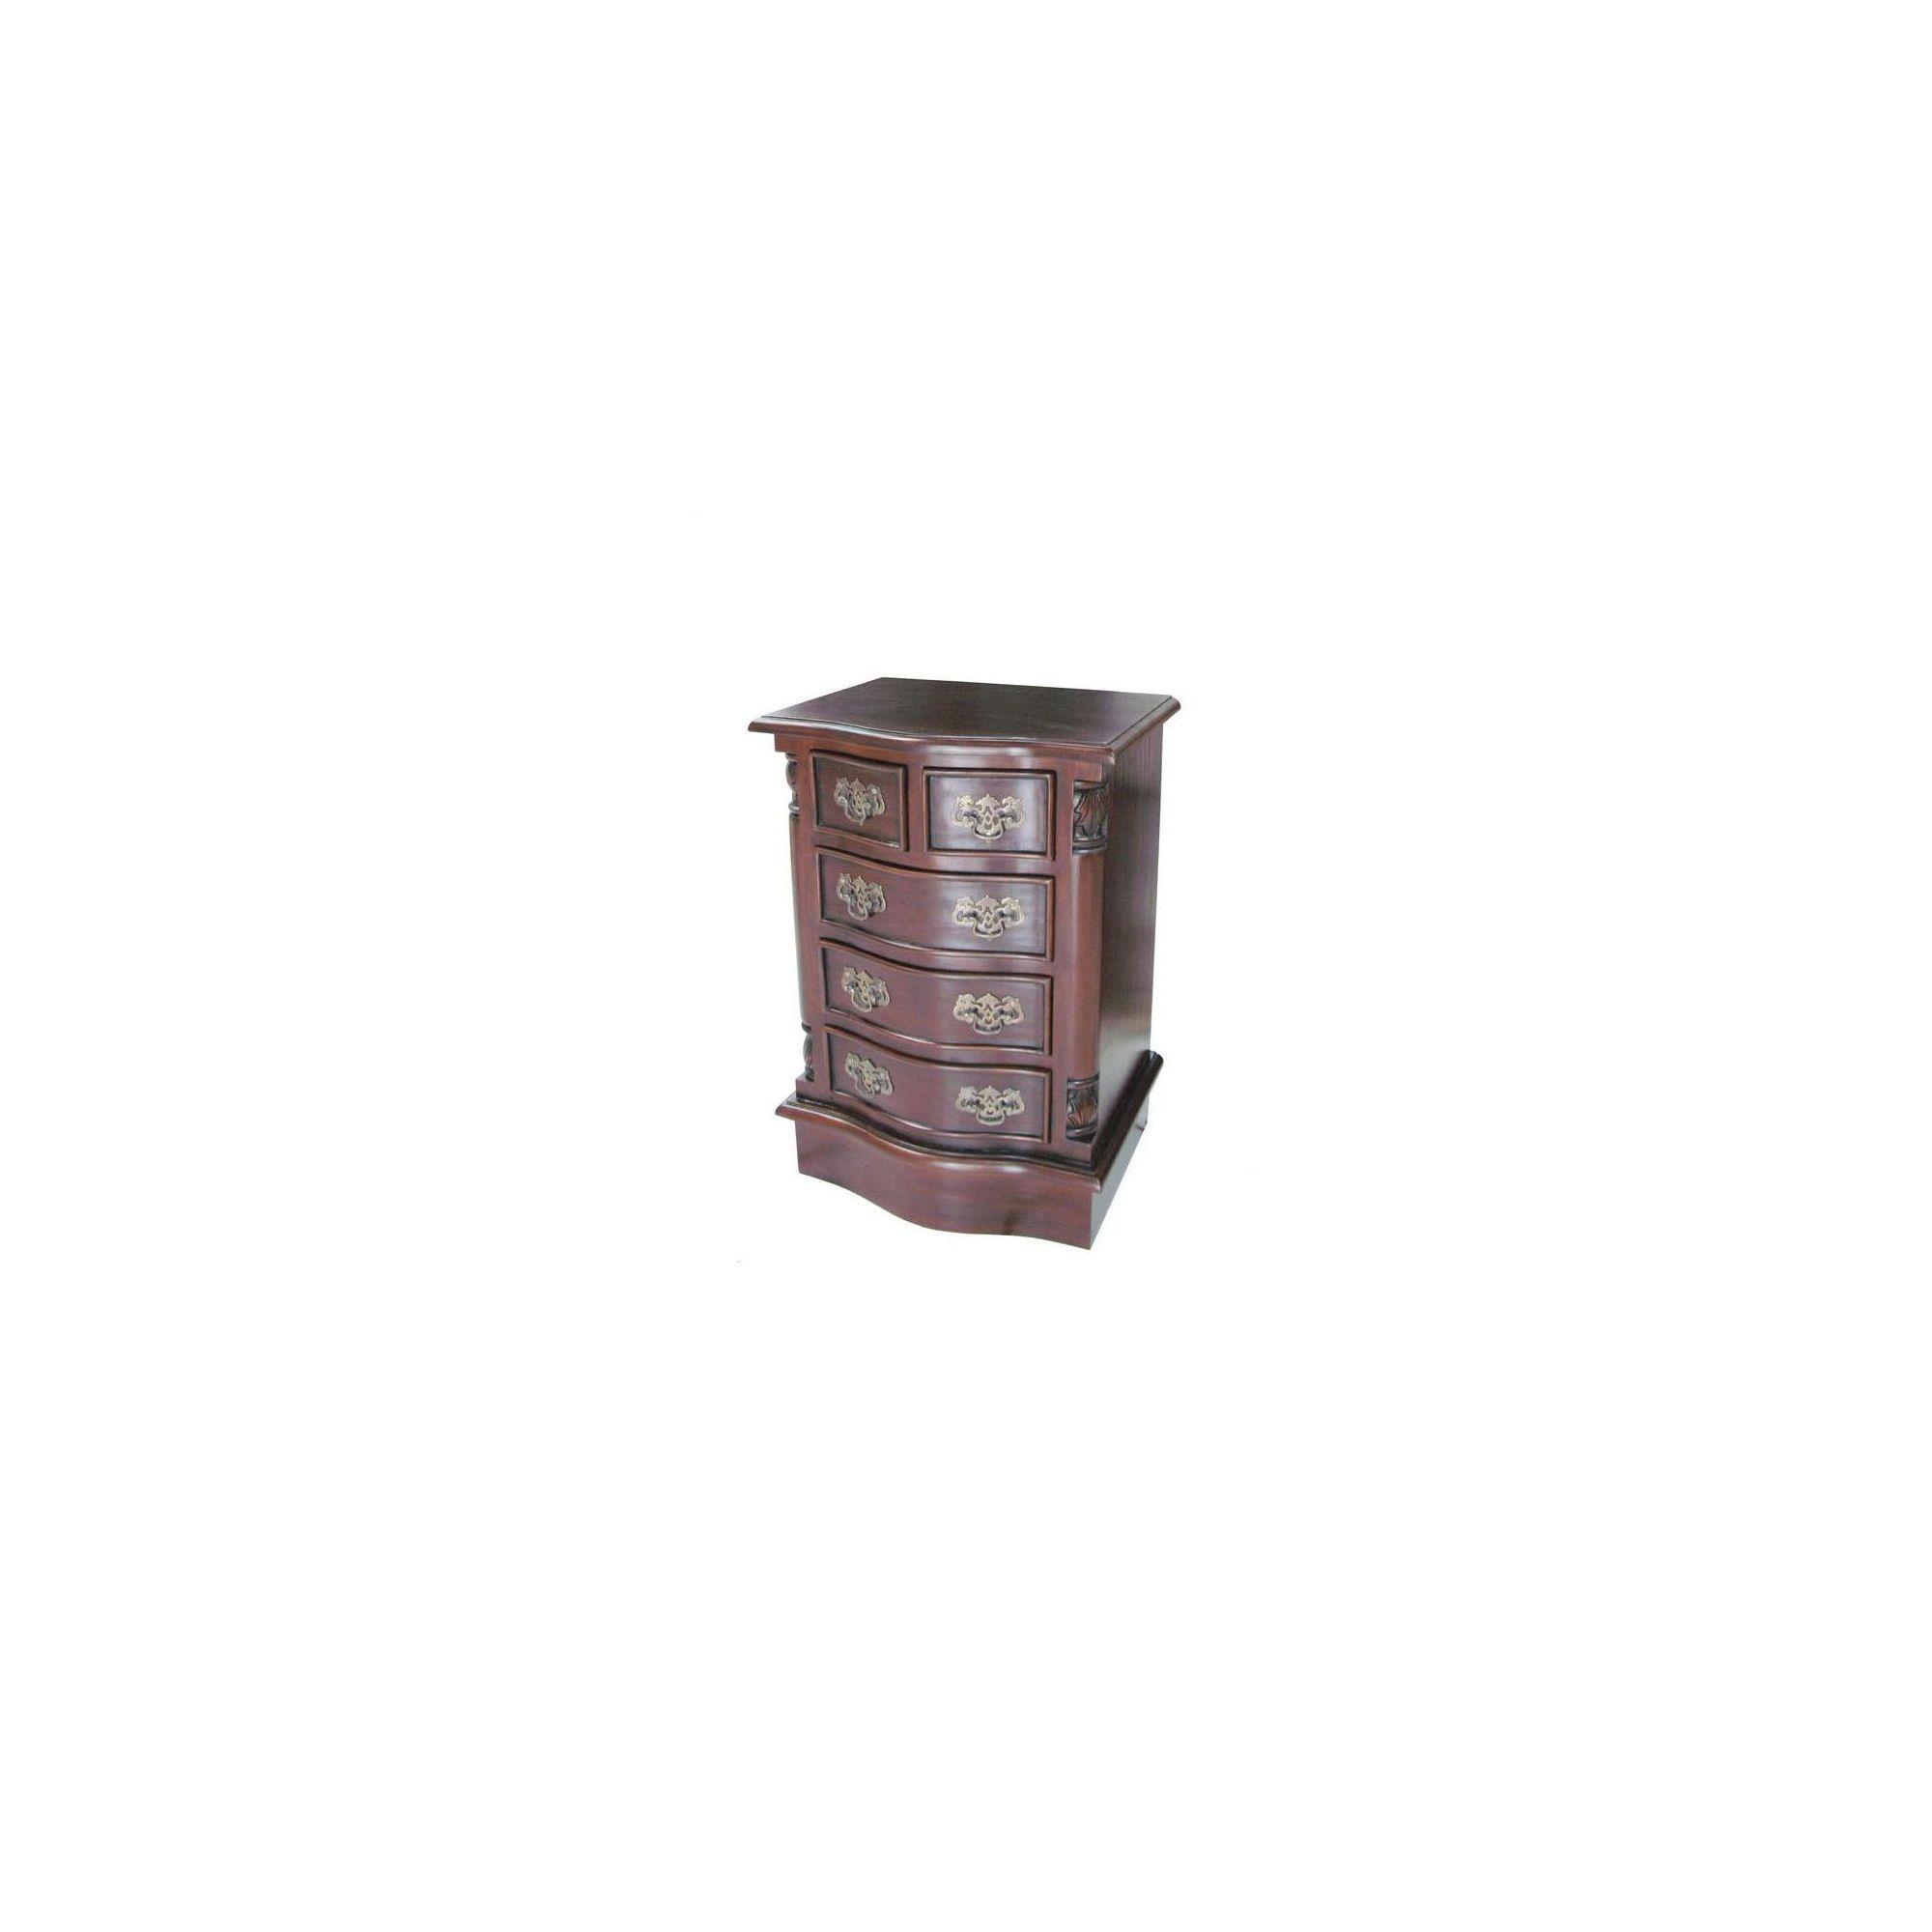 Lock stock and barrel Mahogany 5 Drawer Bowfront Bedside Table in Mahogany - Wax at Tesco Direct